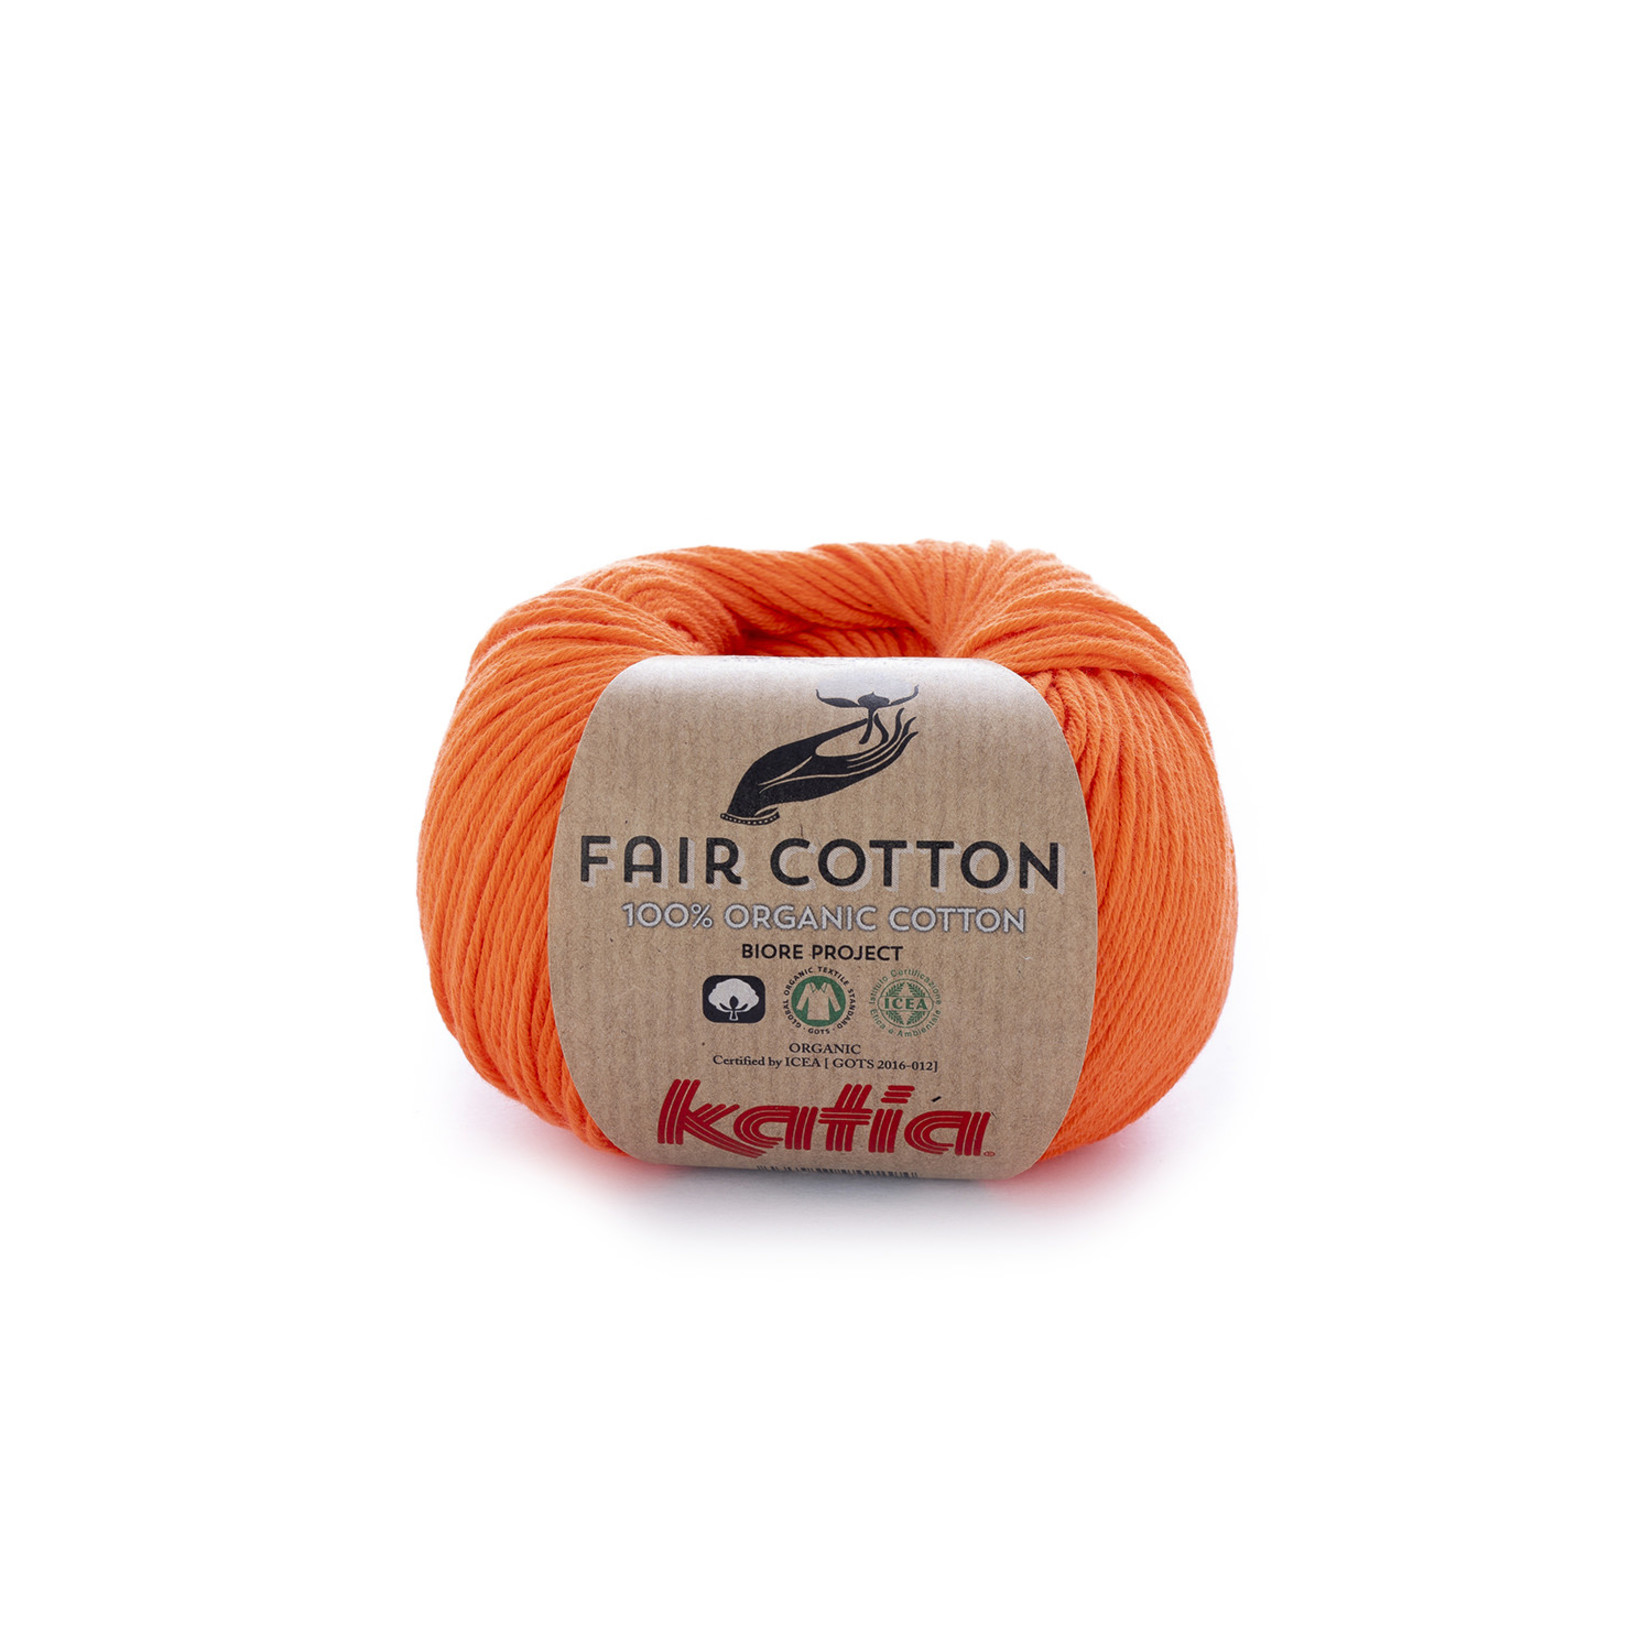 Katia Katia Fair Cotton 31 - oranje - 1 bol = 50 gr. = 155 m. - 100% biol. katoen